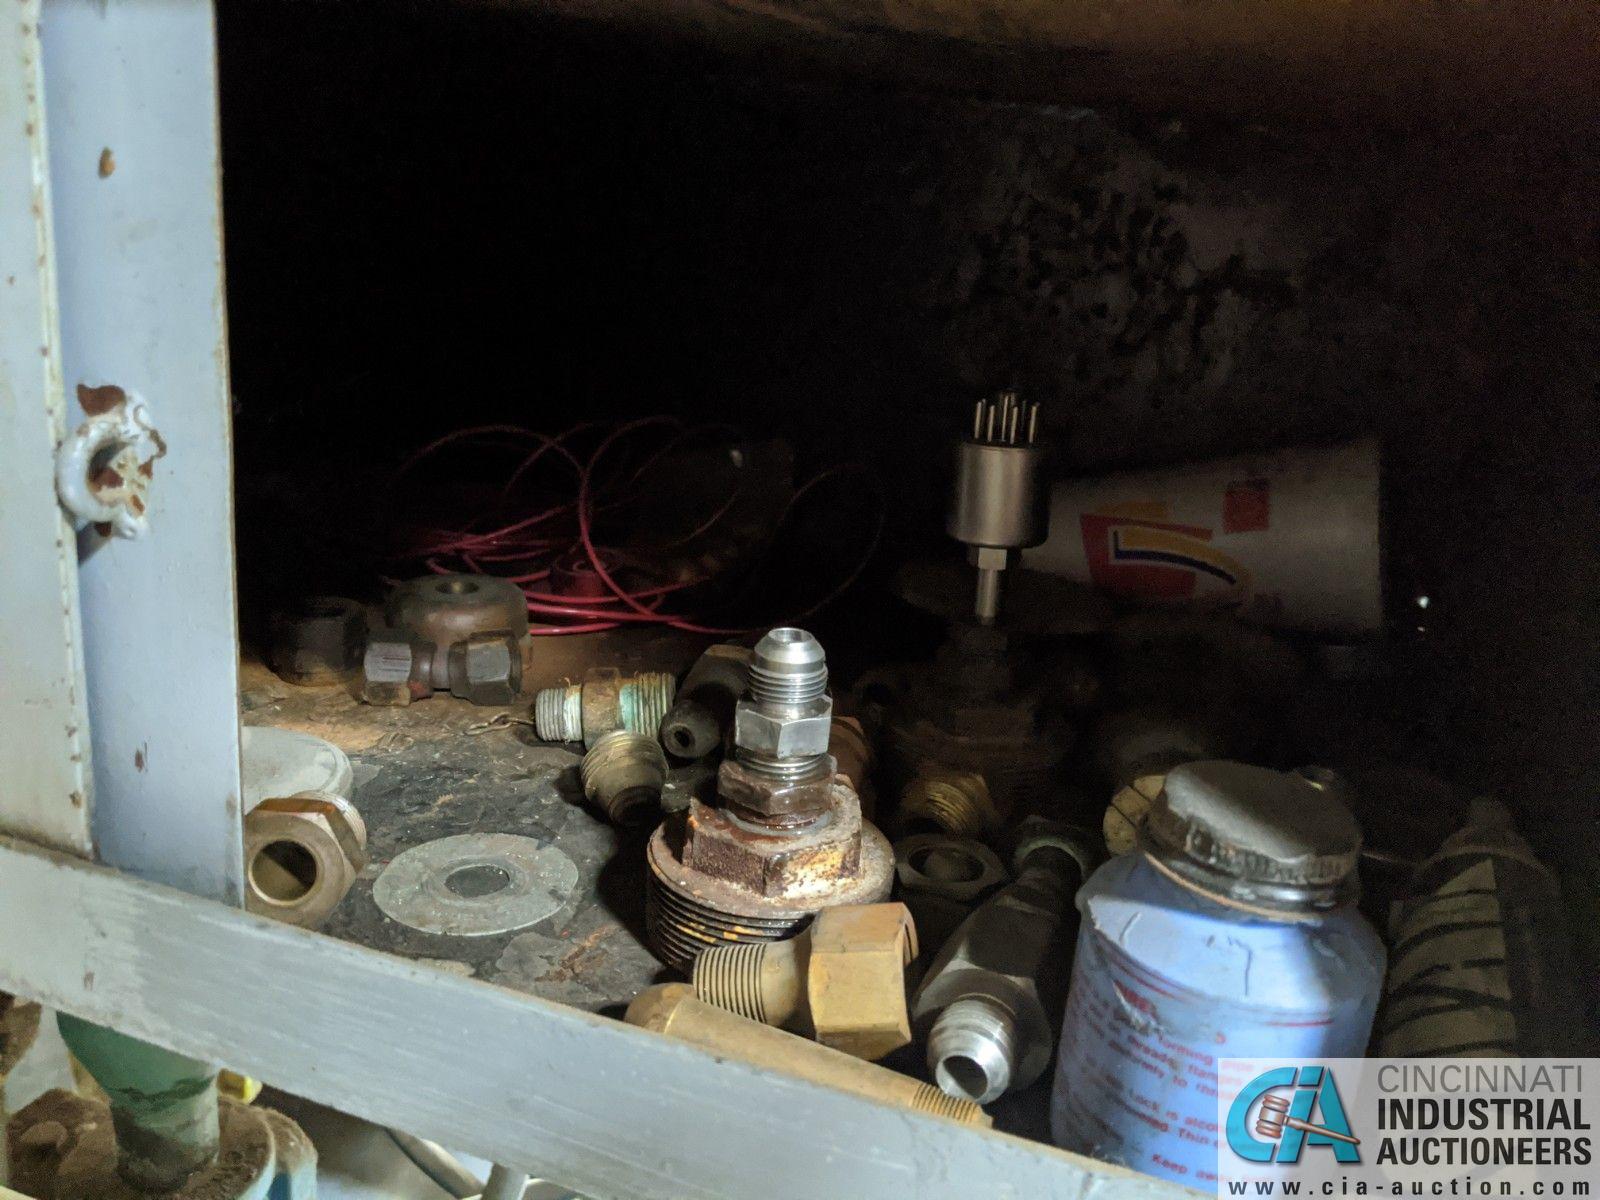 3-HP KINNEY VACUUM PUMP (8635 East Ave., Mentor, OH 44060 - John Magnasum: 440-667-9414) - Image 4 of 5